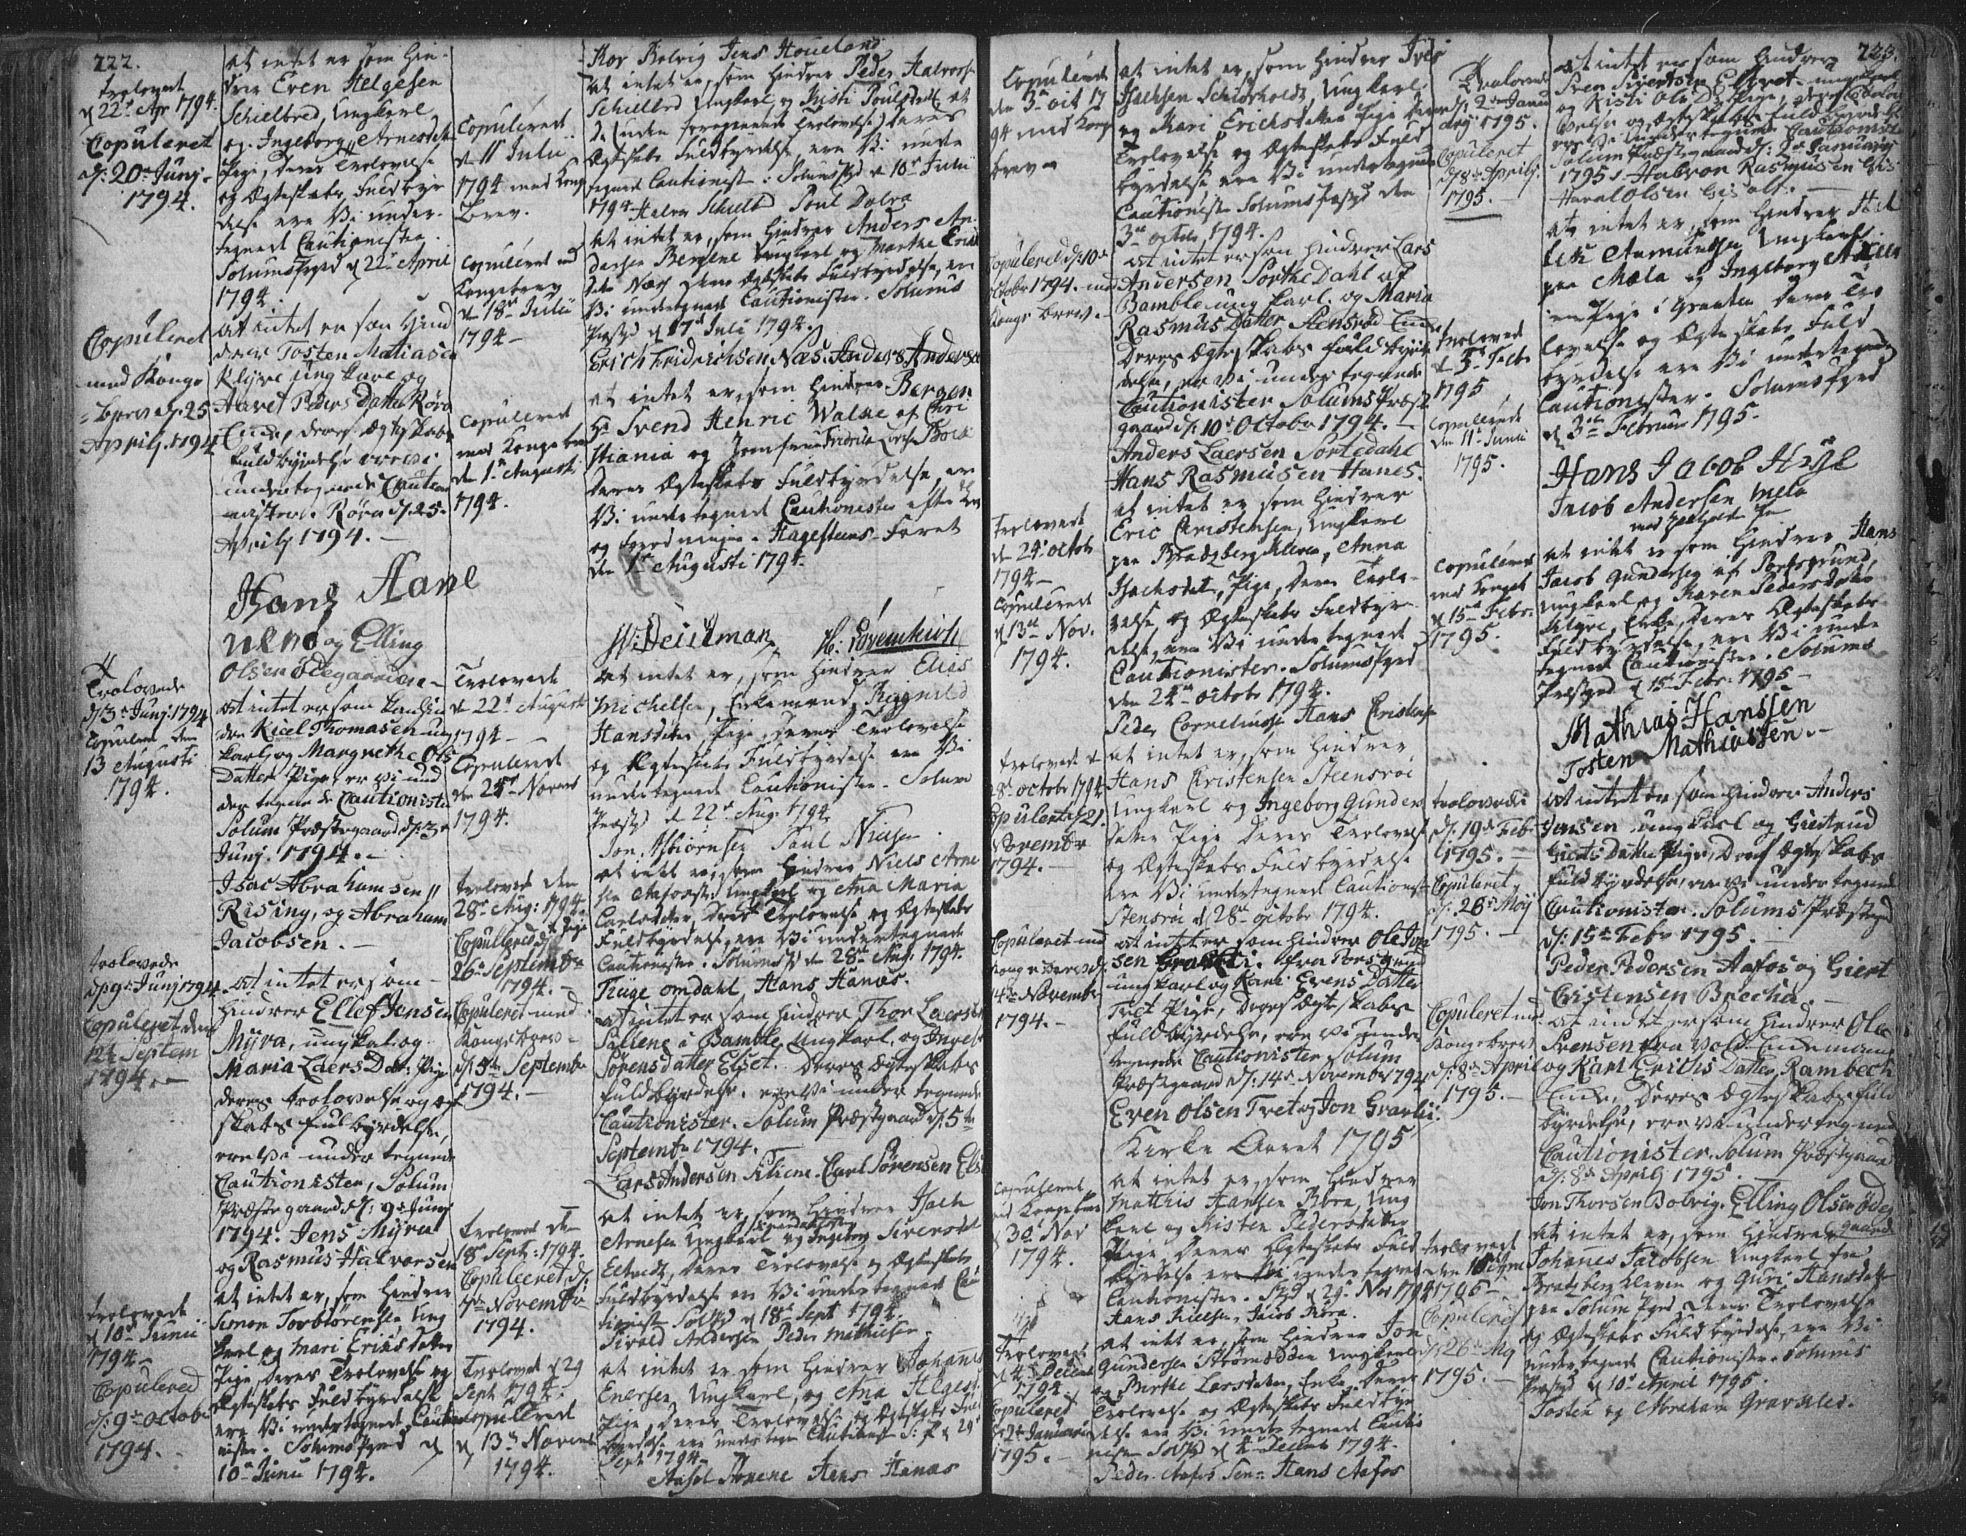 SAKO, Solum kirkebøker, F/Fa/L0003: Ministerialbok nr. I 3, 1761-1814, s. 222-223